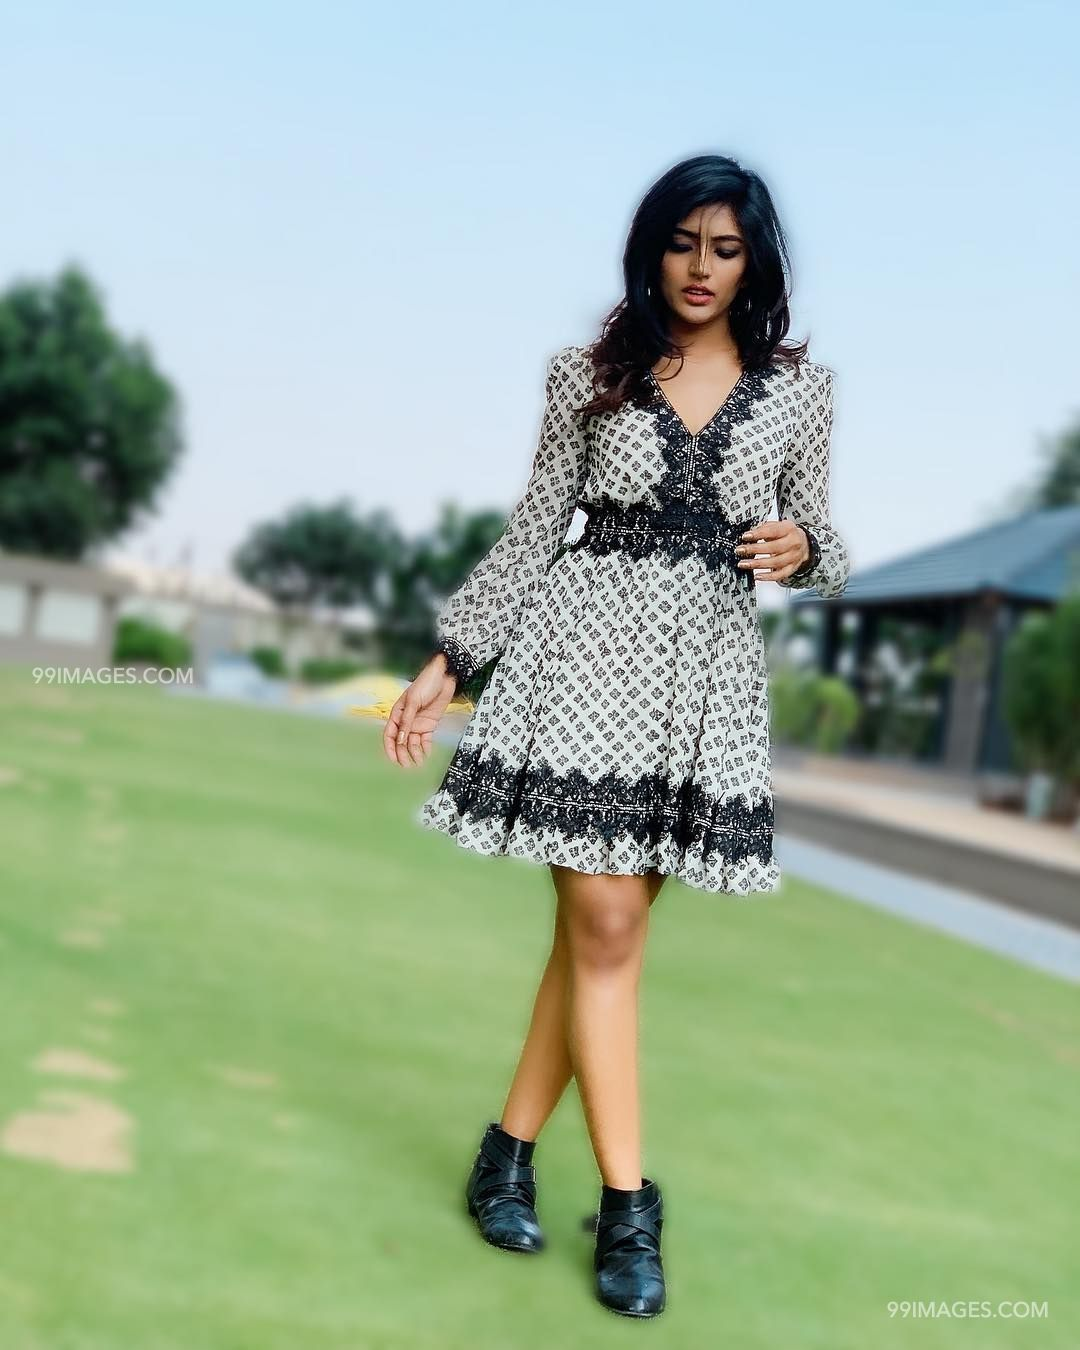 Eesha Rebba Beautiful Photos & Mobile Wallpapers HD